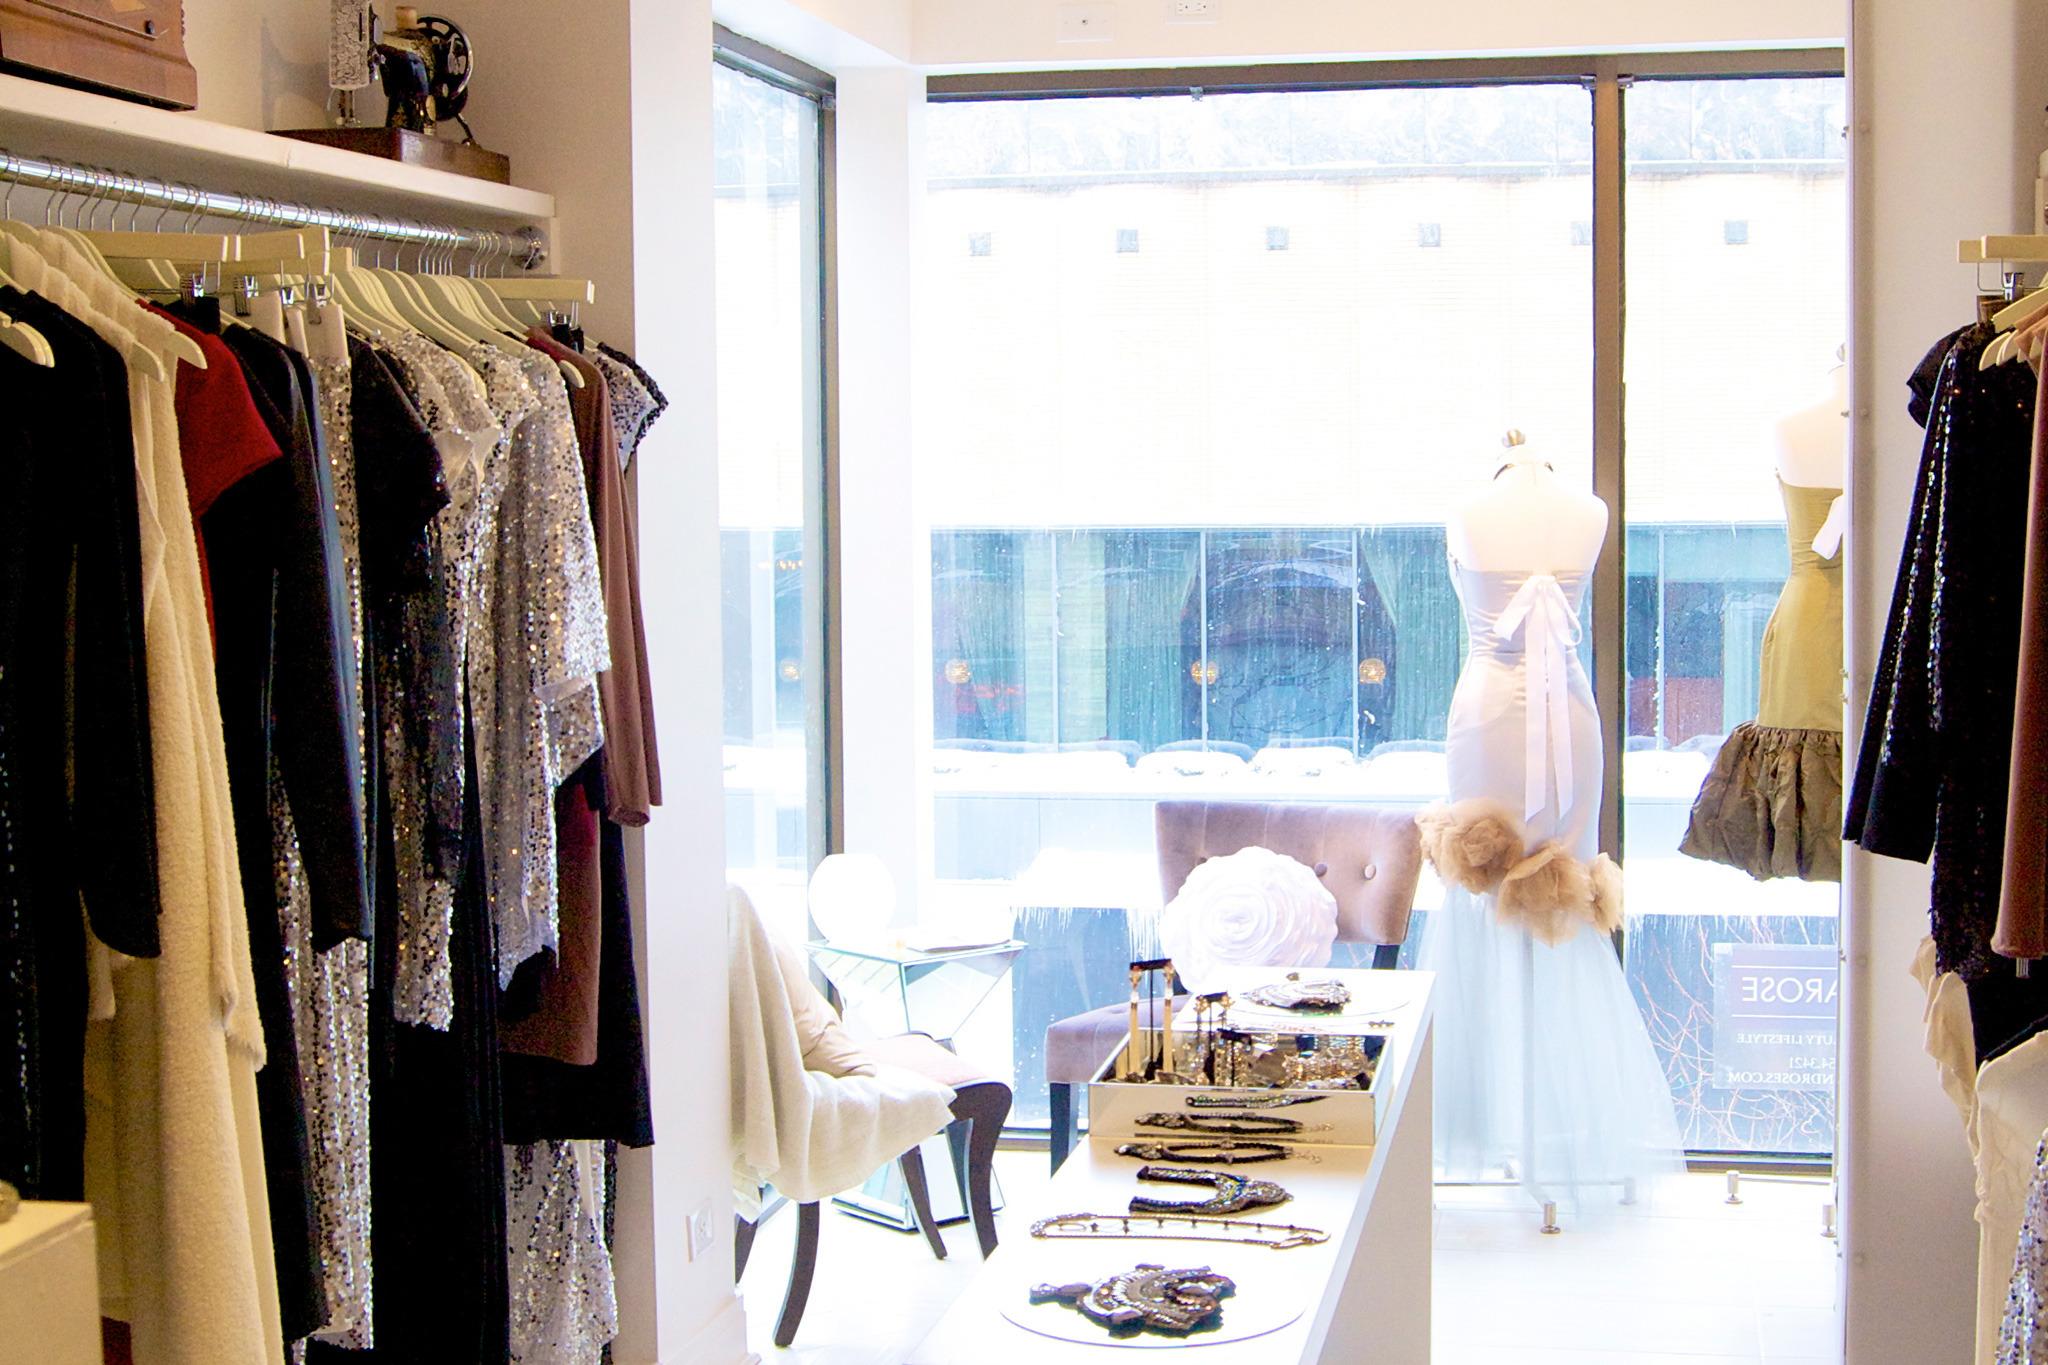 <p>Sararose showcases eco- and animal-friendly women's clothing.</p>